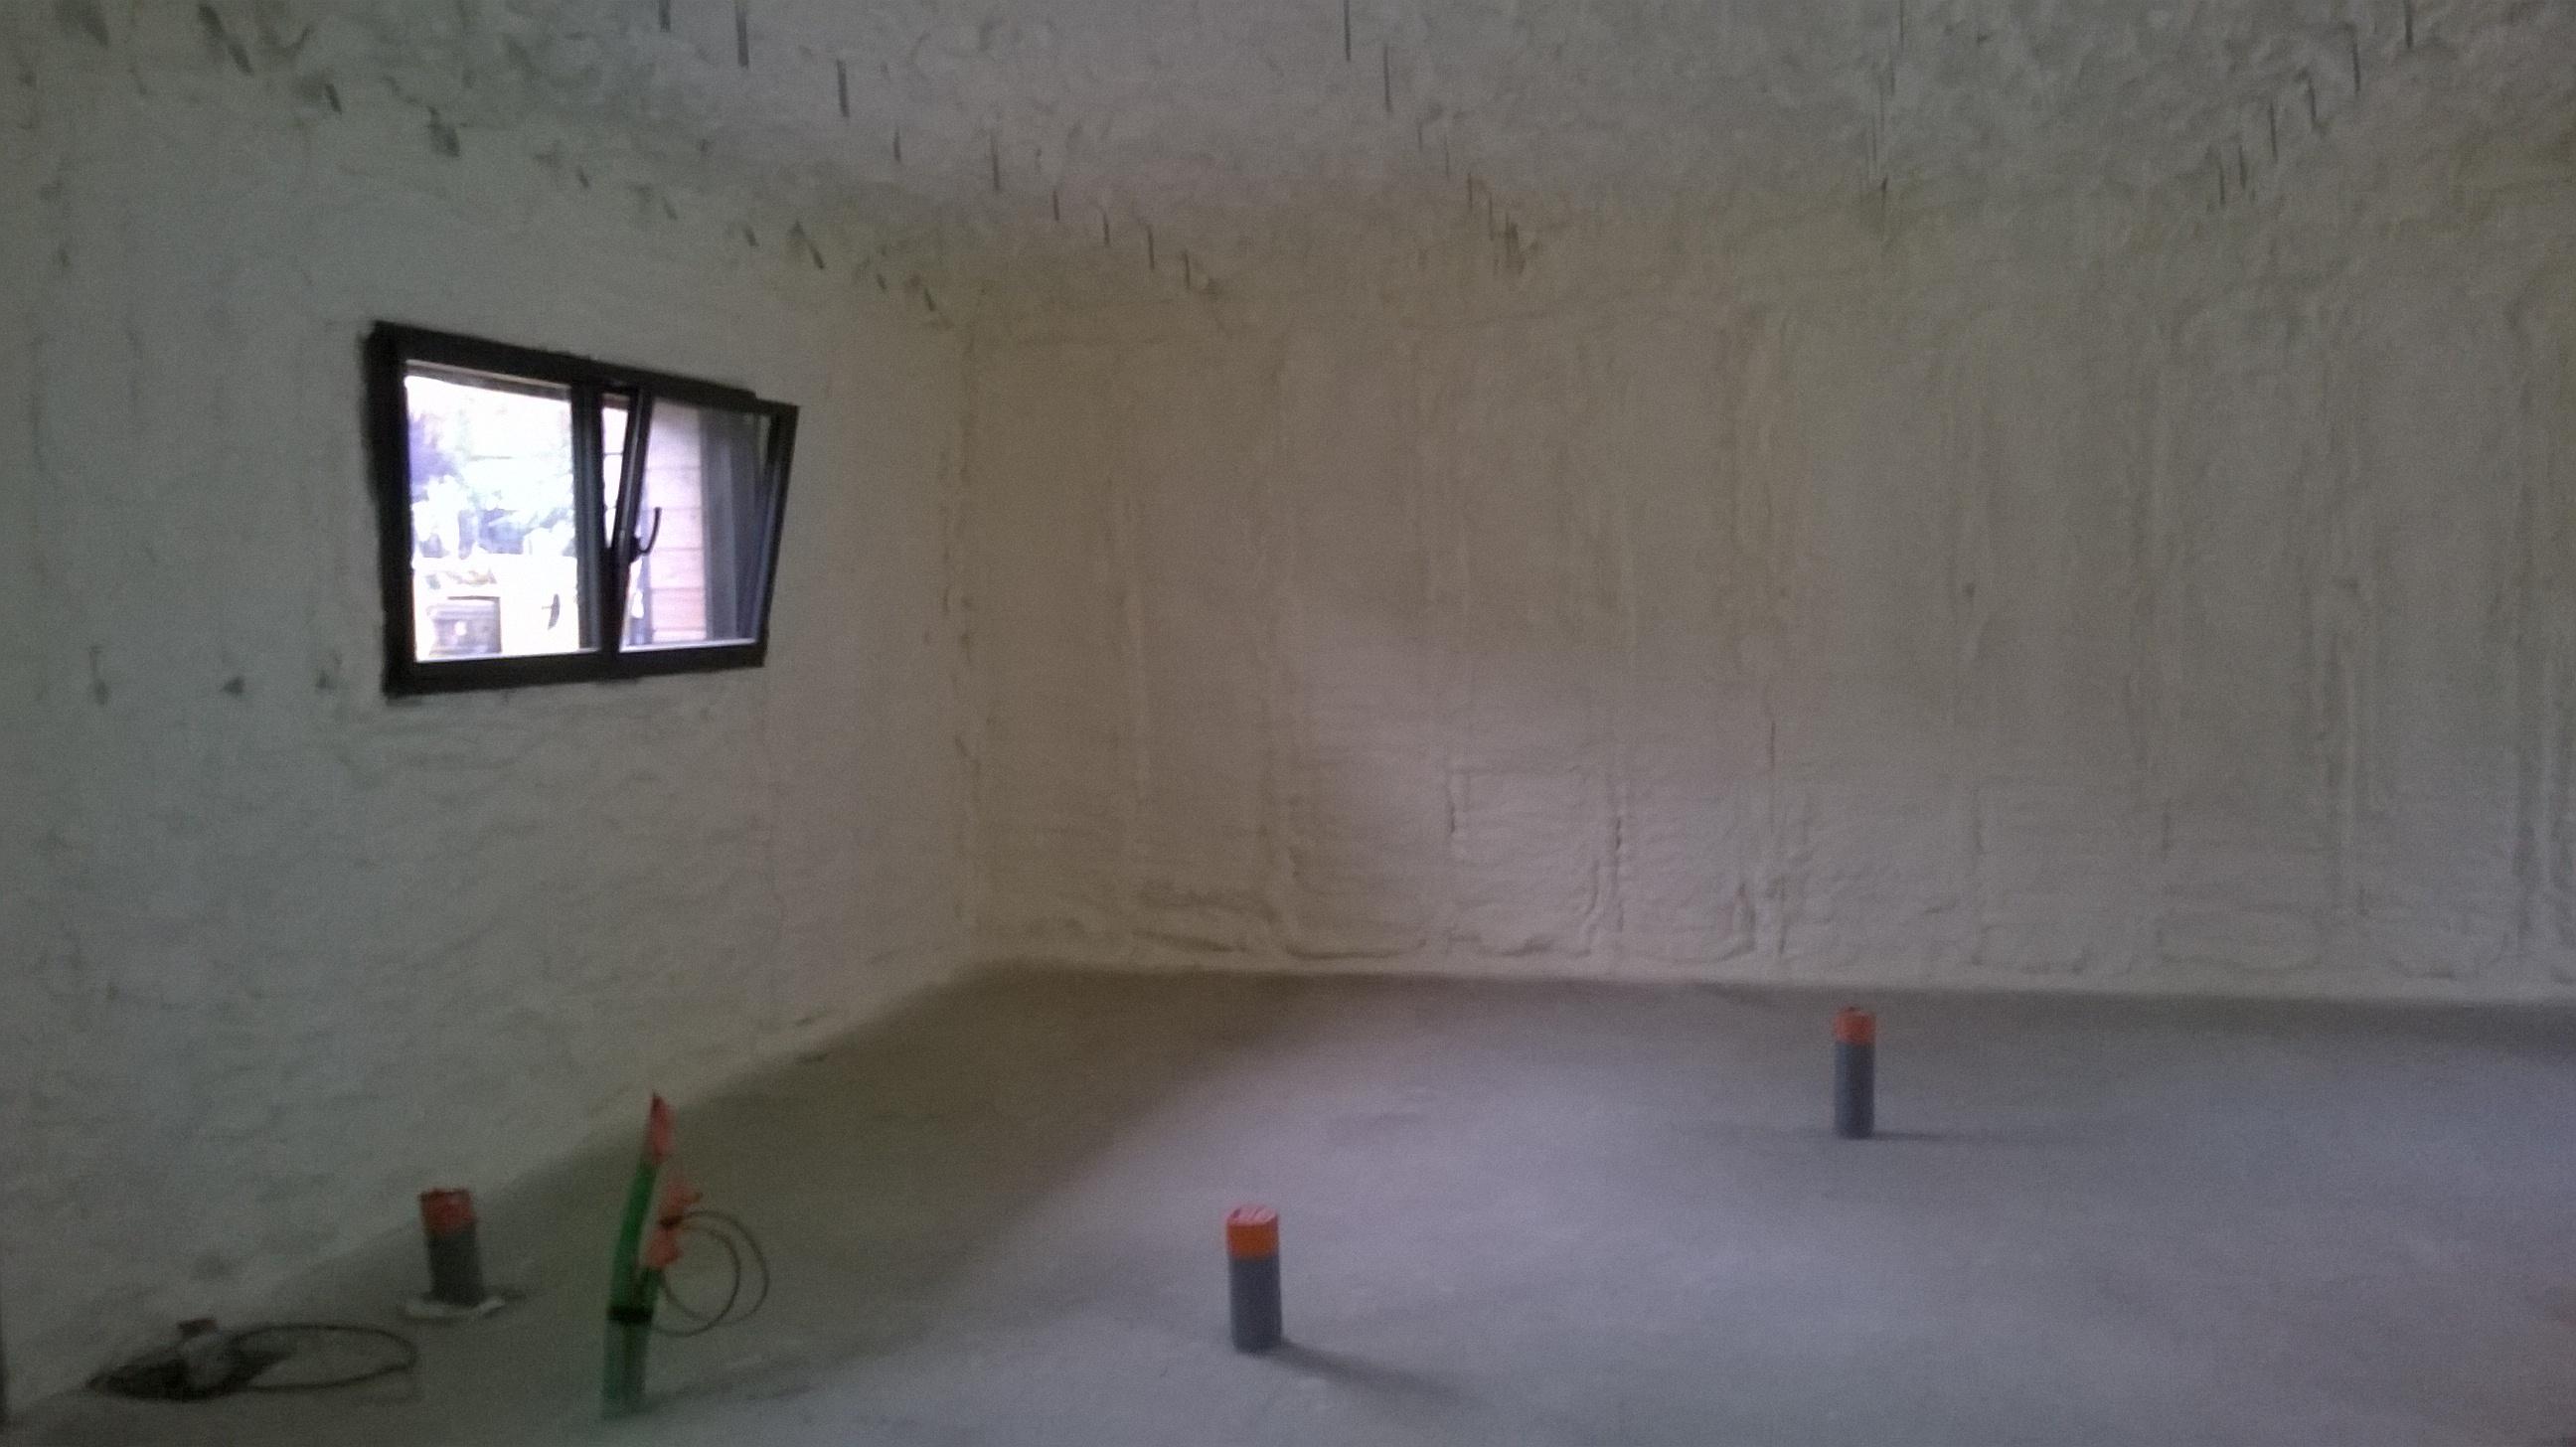 isolation chambre une chambre en cours duisolation with isolation chambre chambre froideu with. Black Bedroom Furniture Sets. Home Design Ideas